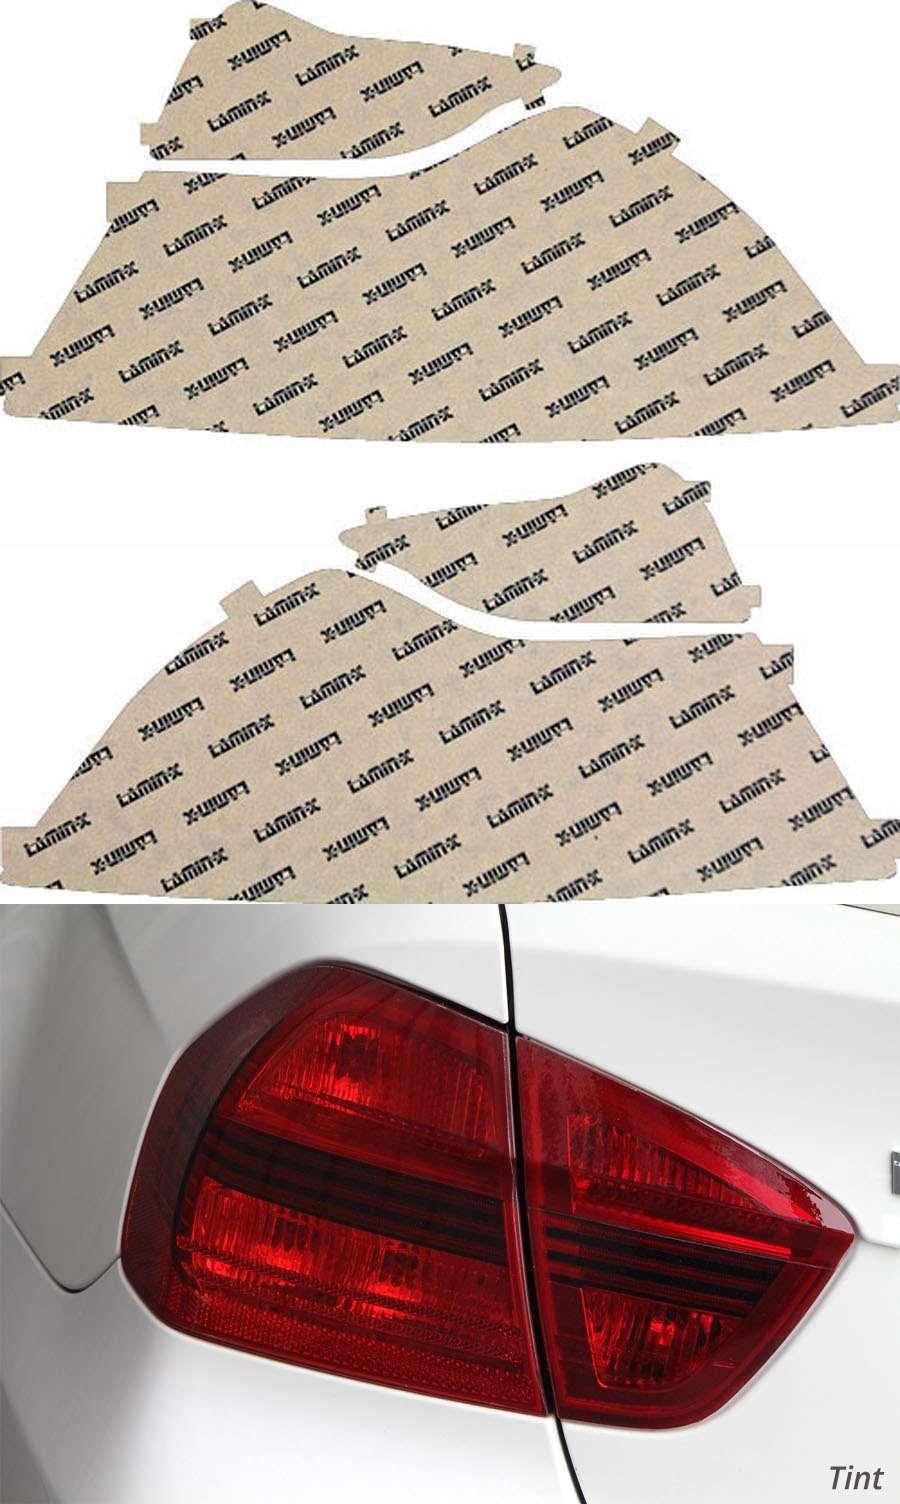 Volvo C70 11-13 Tint Tail Light Covers Lamin-X V218T